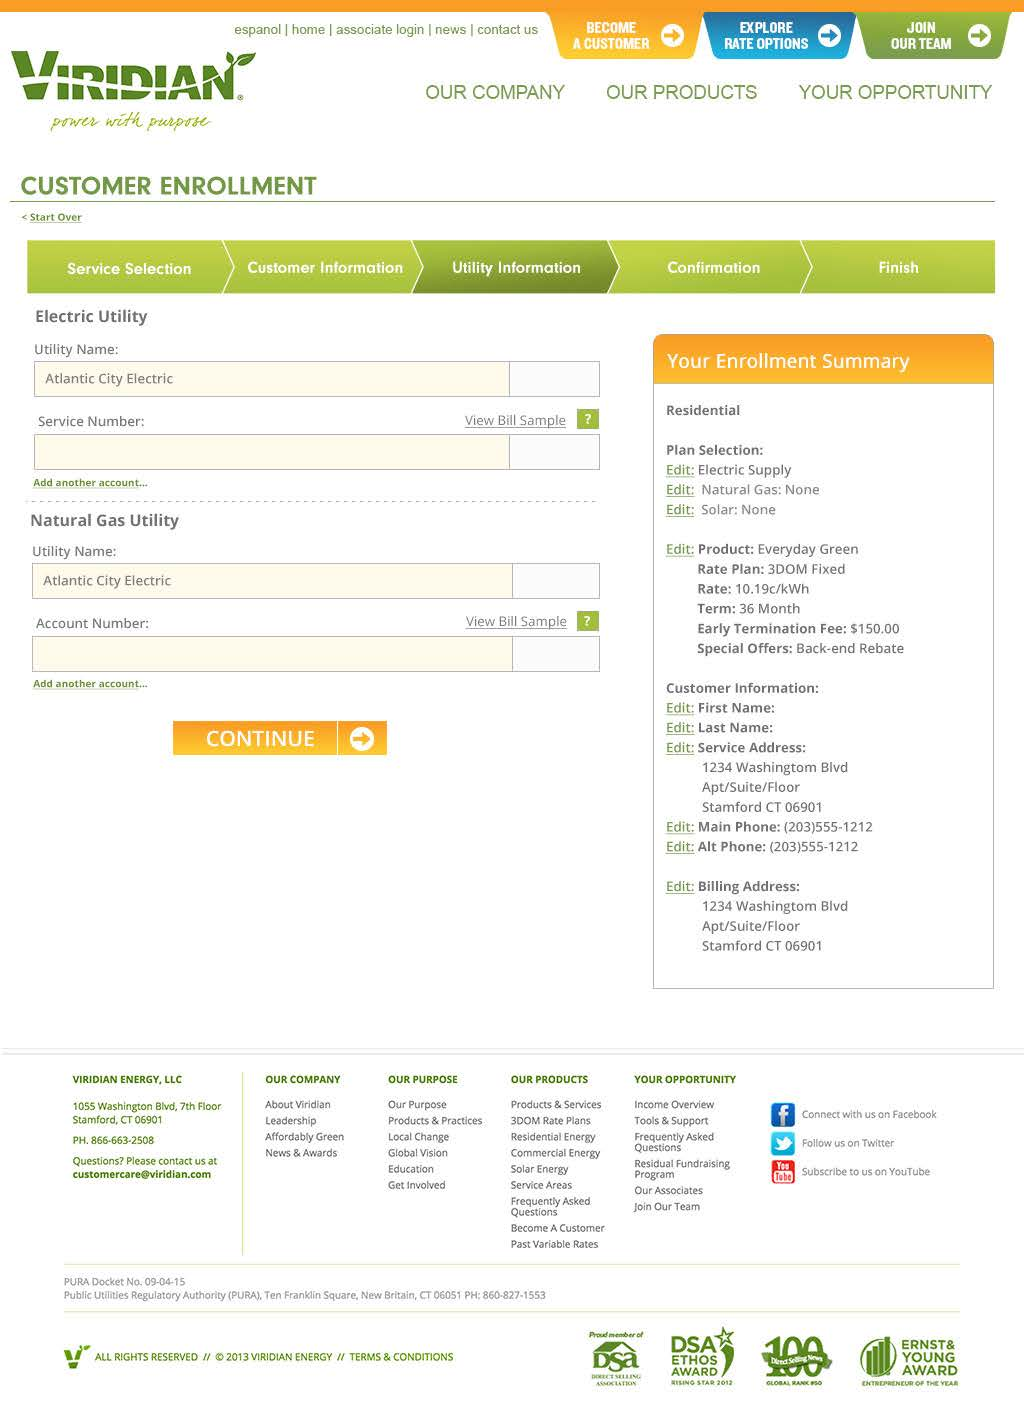 Customer Enrollment Screens 04282015_Page_08